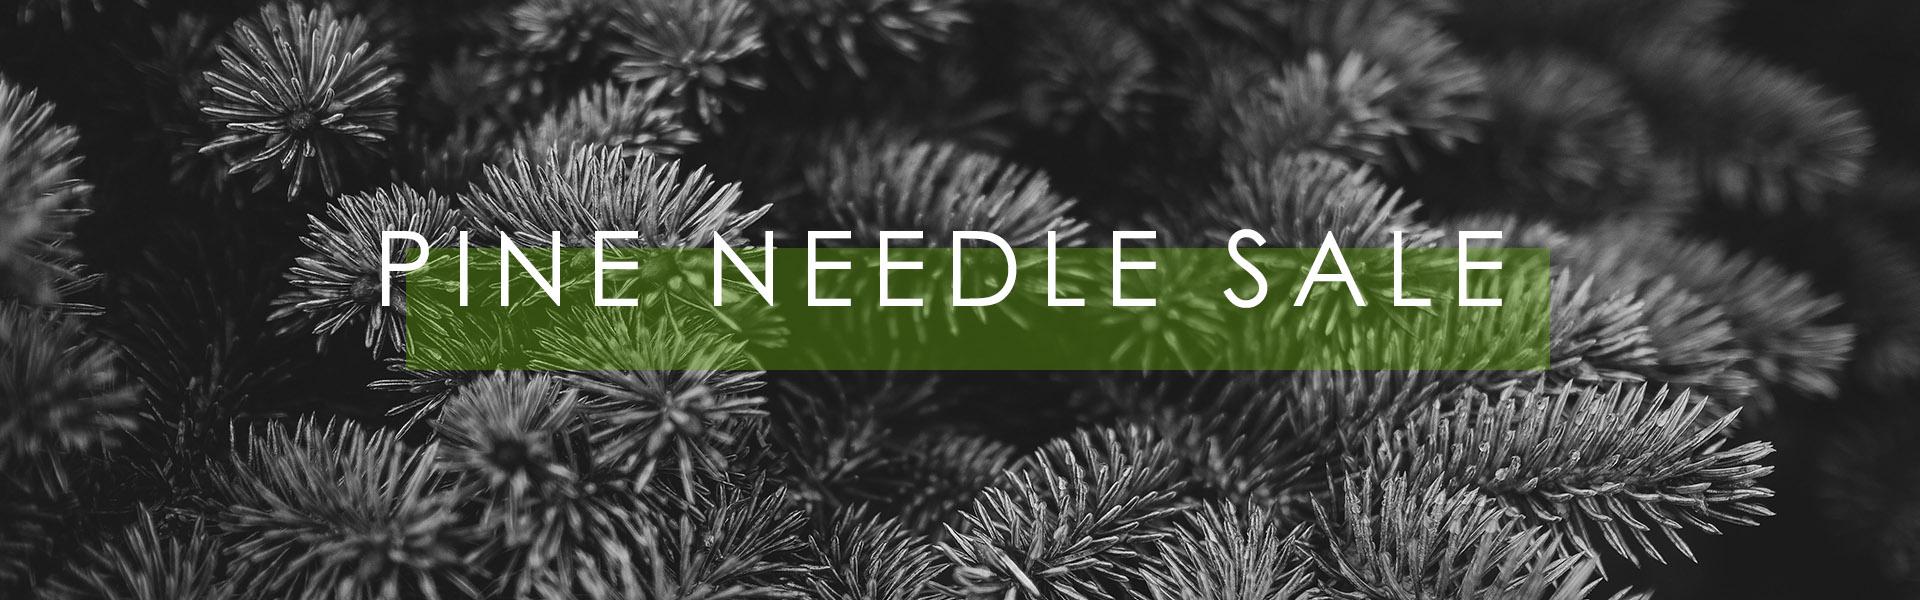 Pine Needle Sale